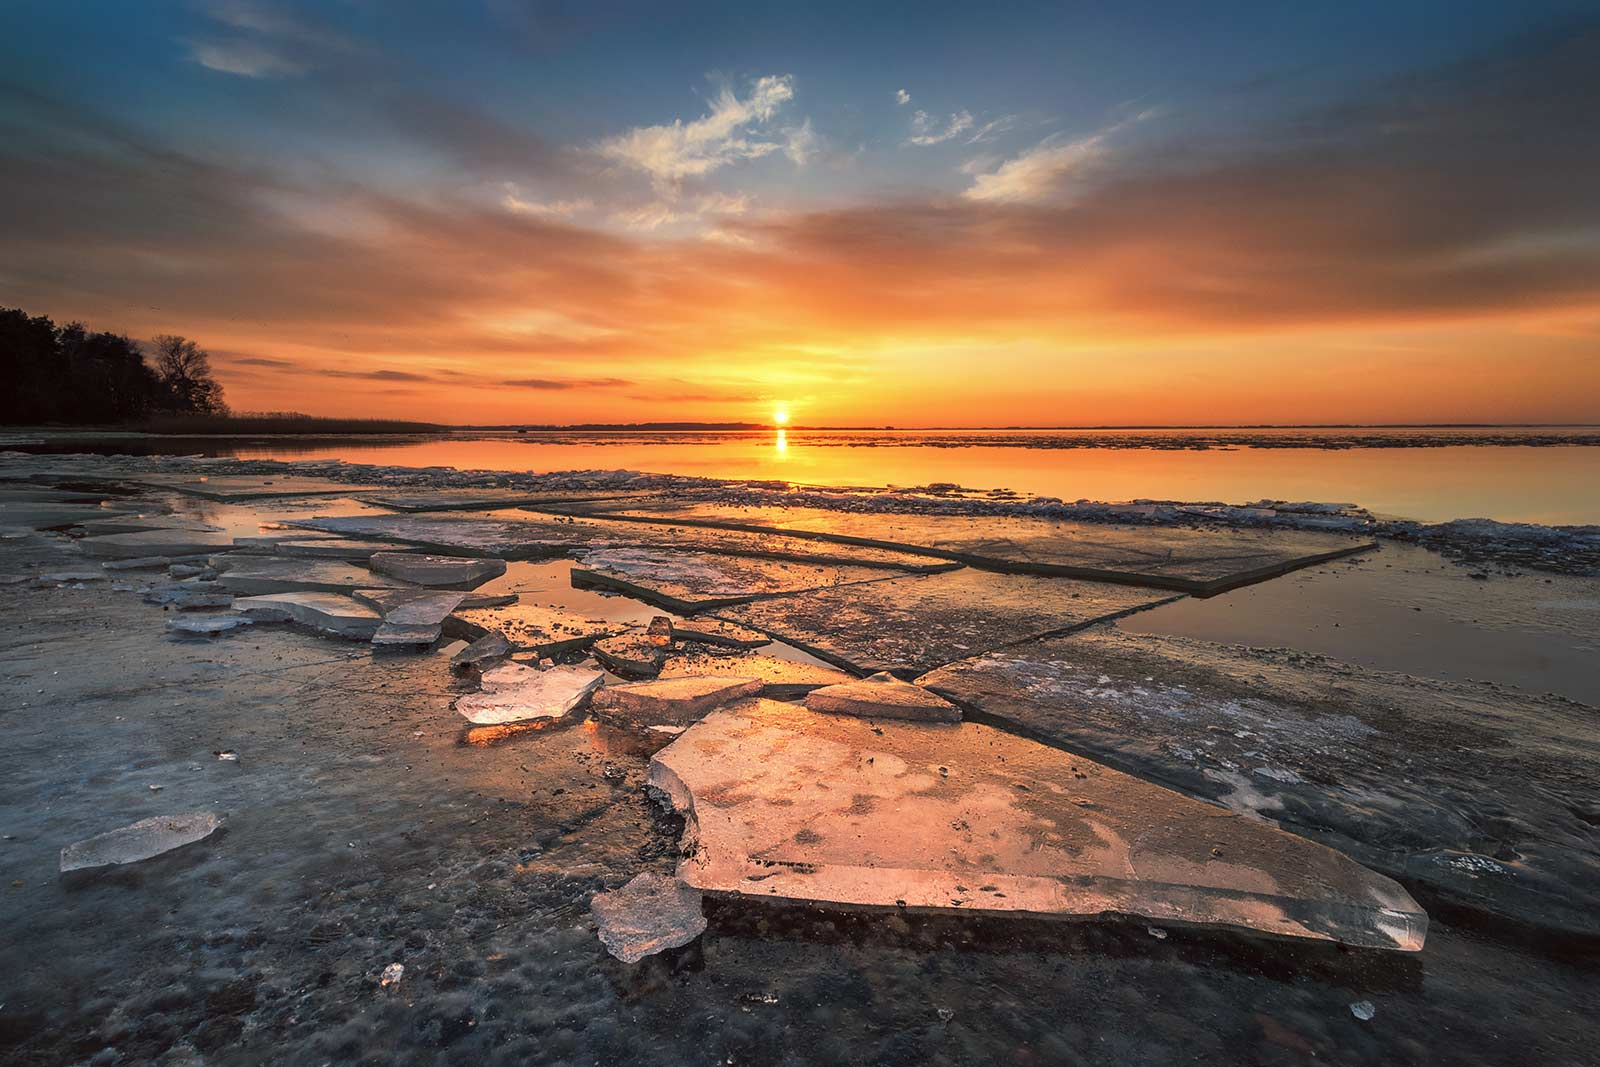 Sonnenuntergang Insel Usedom Achterwasser Strand